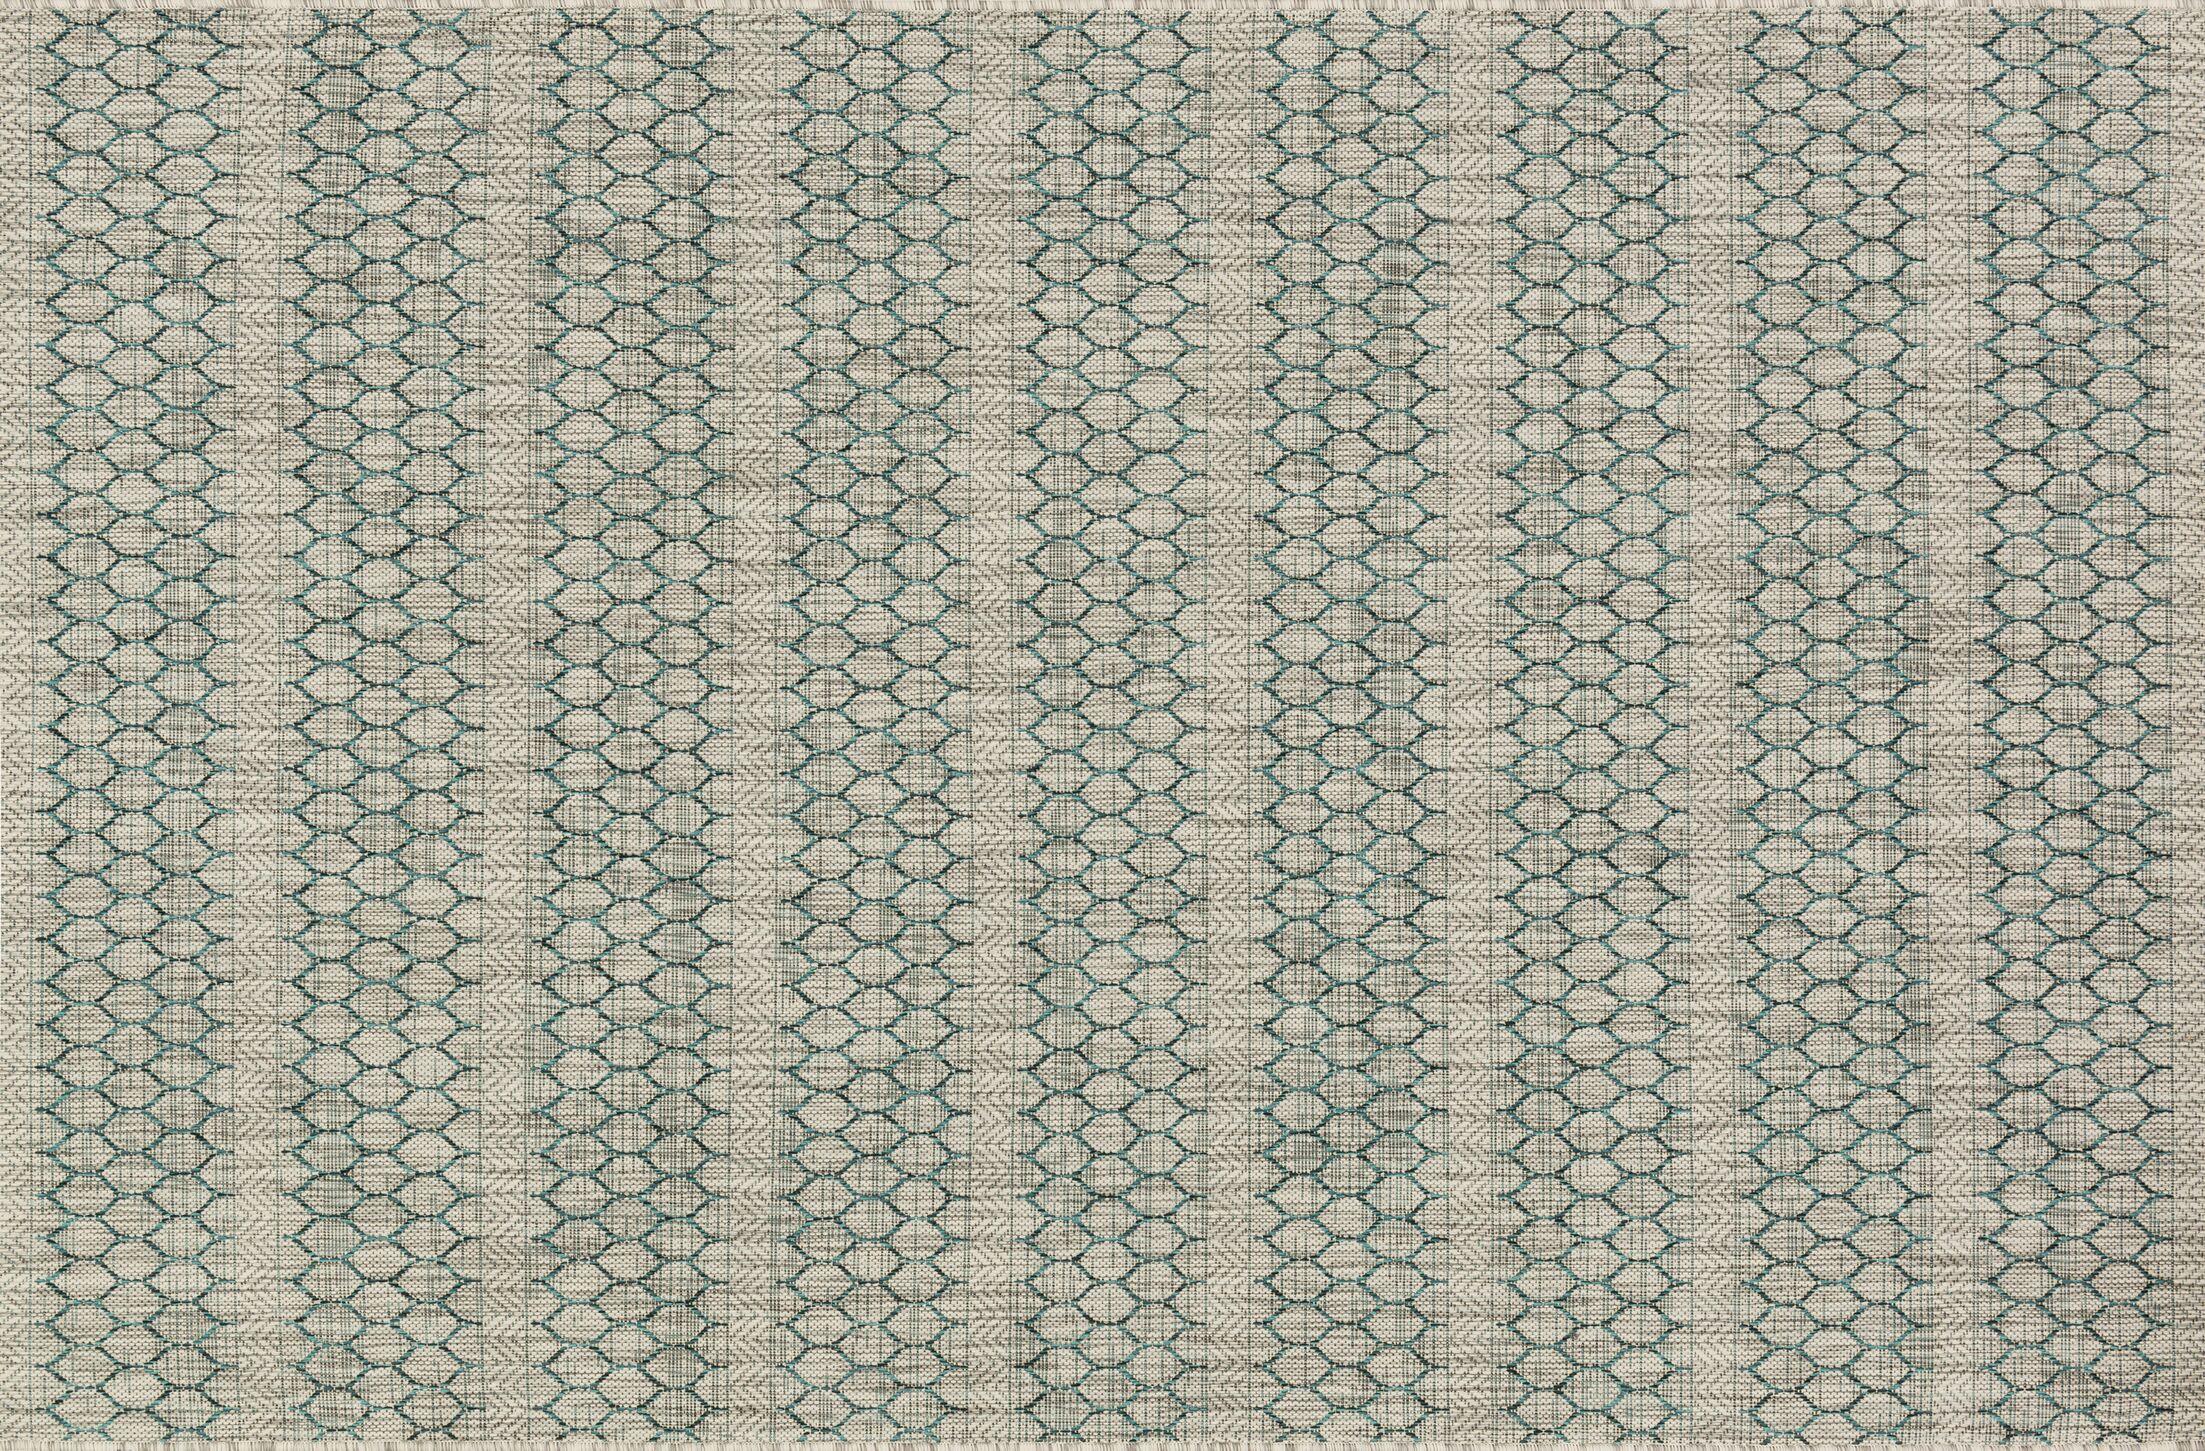 Bundy Gray/Teal Indoor/Outdoor Area Rug Rug Size: Rectangle 3'11